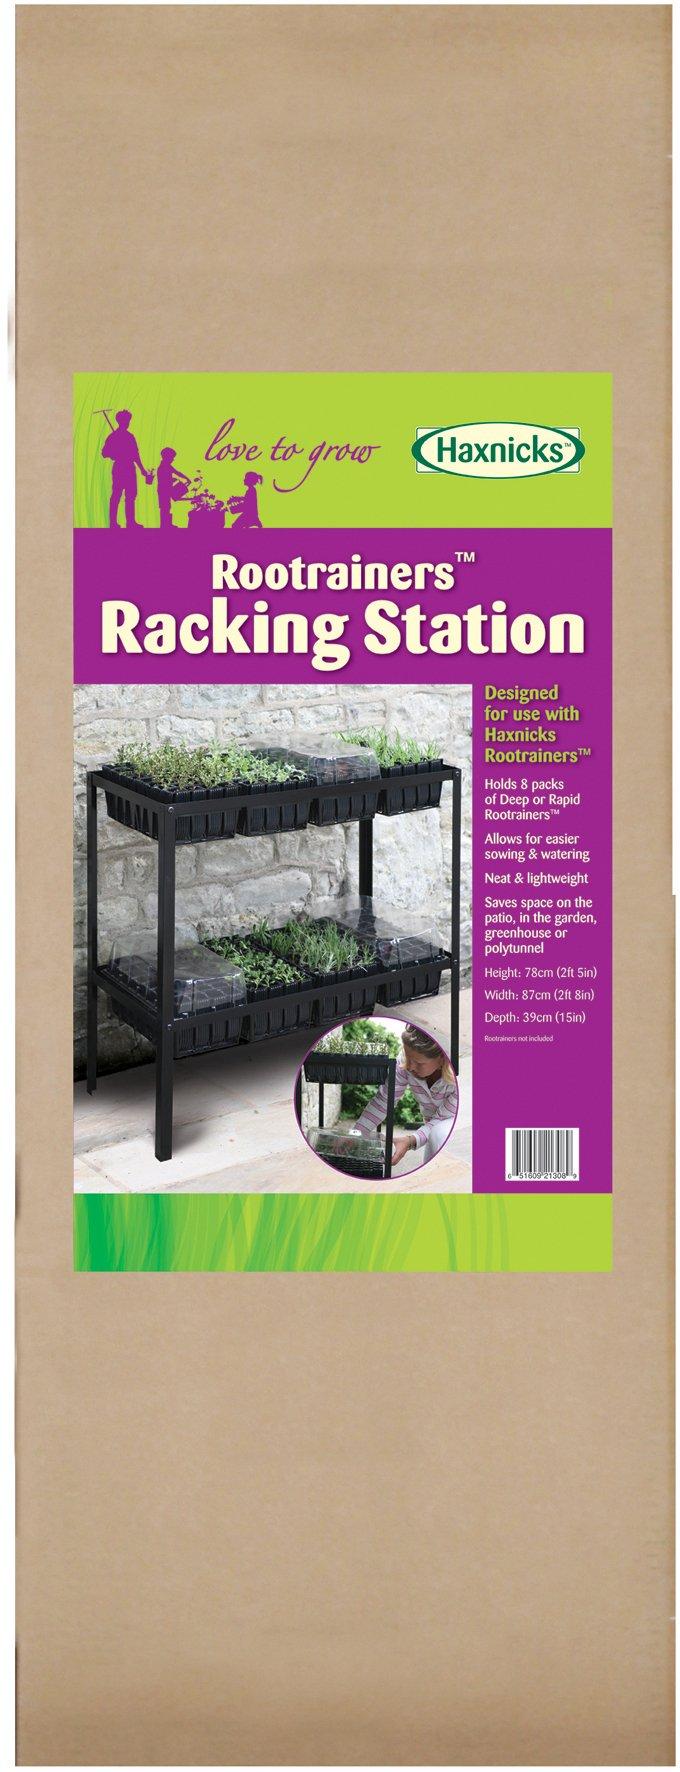 Tierra Garden 50-9020 Haxnicks Root Rainer Racking Station by Tierra Garden